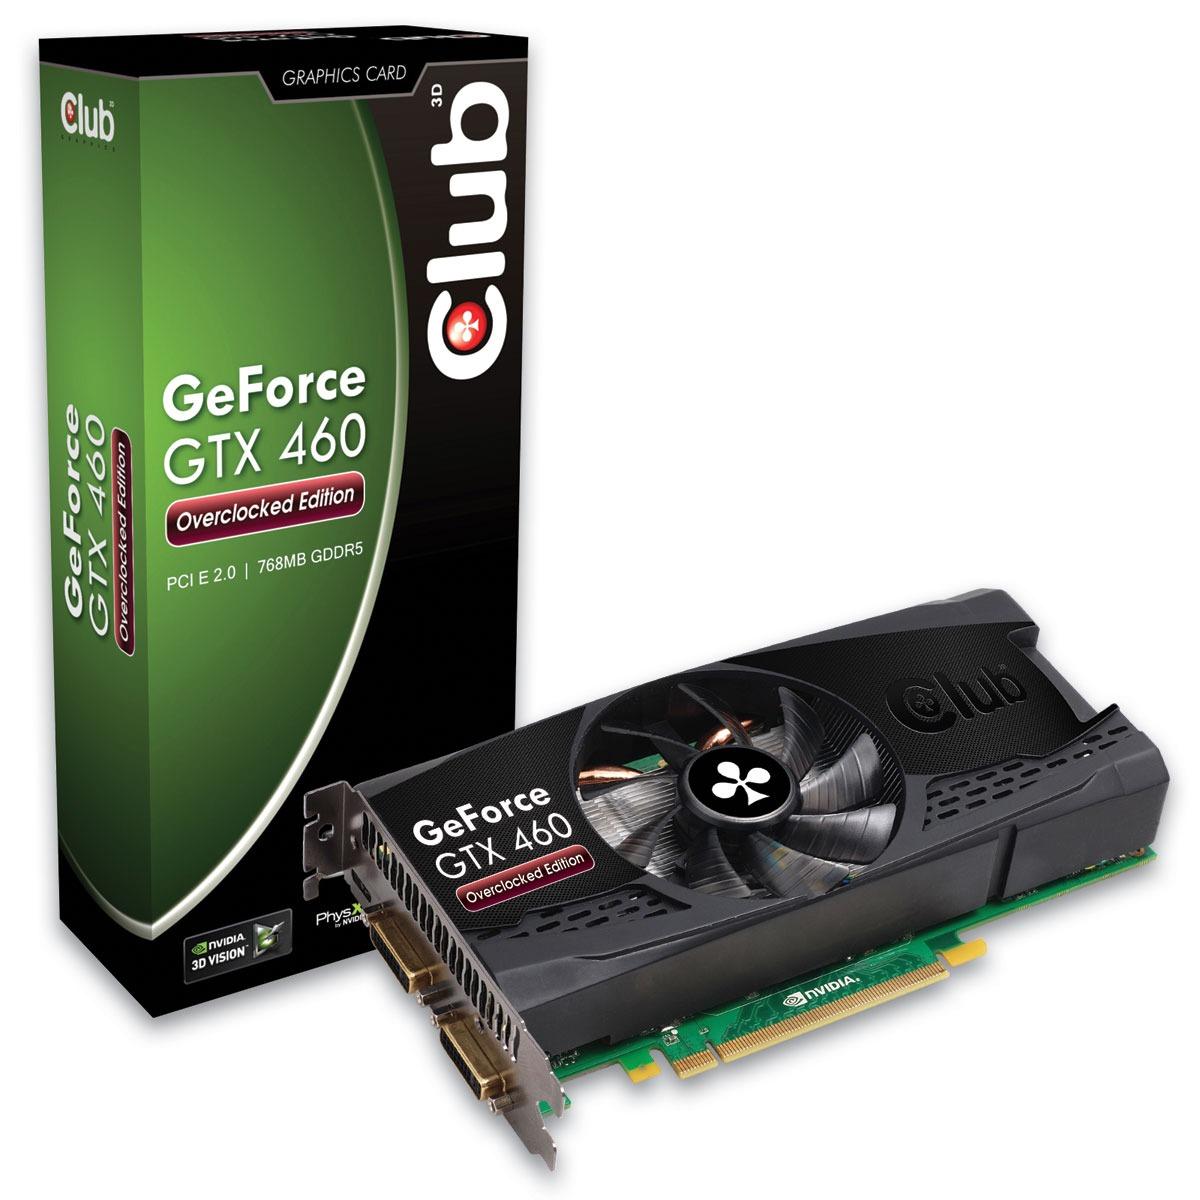 Carte graphique Club 3D GTX 460 Overclocked Edition 768 Mo Club 3D GTX 460 Overclocked Edition - 768 Mo Dual DVI/Mini HDMI - PCI-Express (NVIDIA GeForce avec CUDA GTX 460)